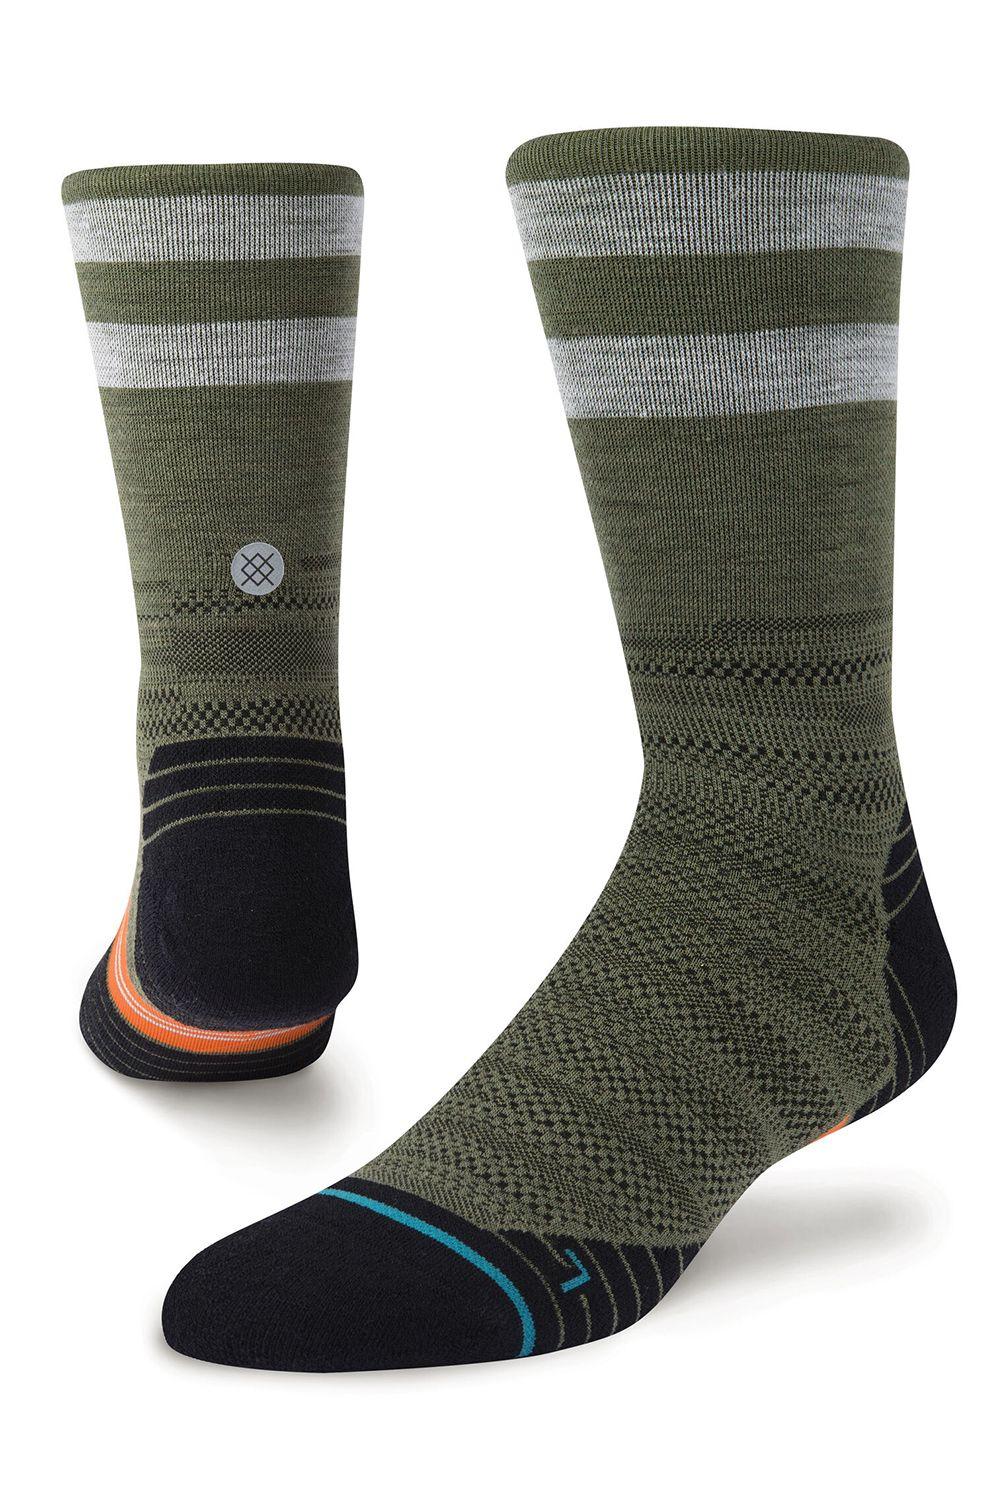 Stance Socks CUDI CREW Olive